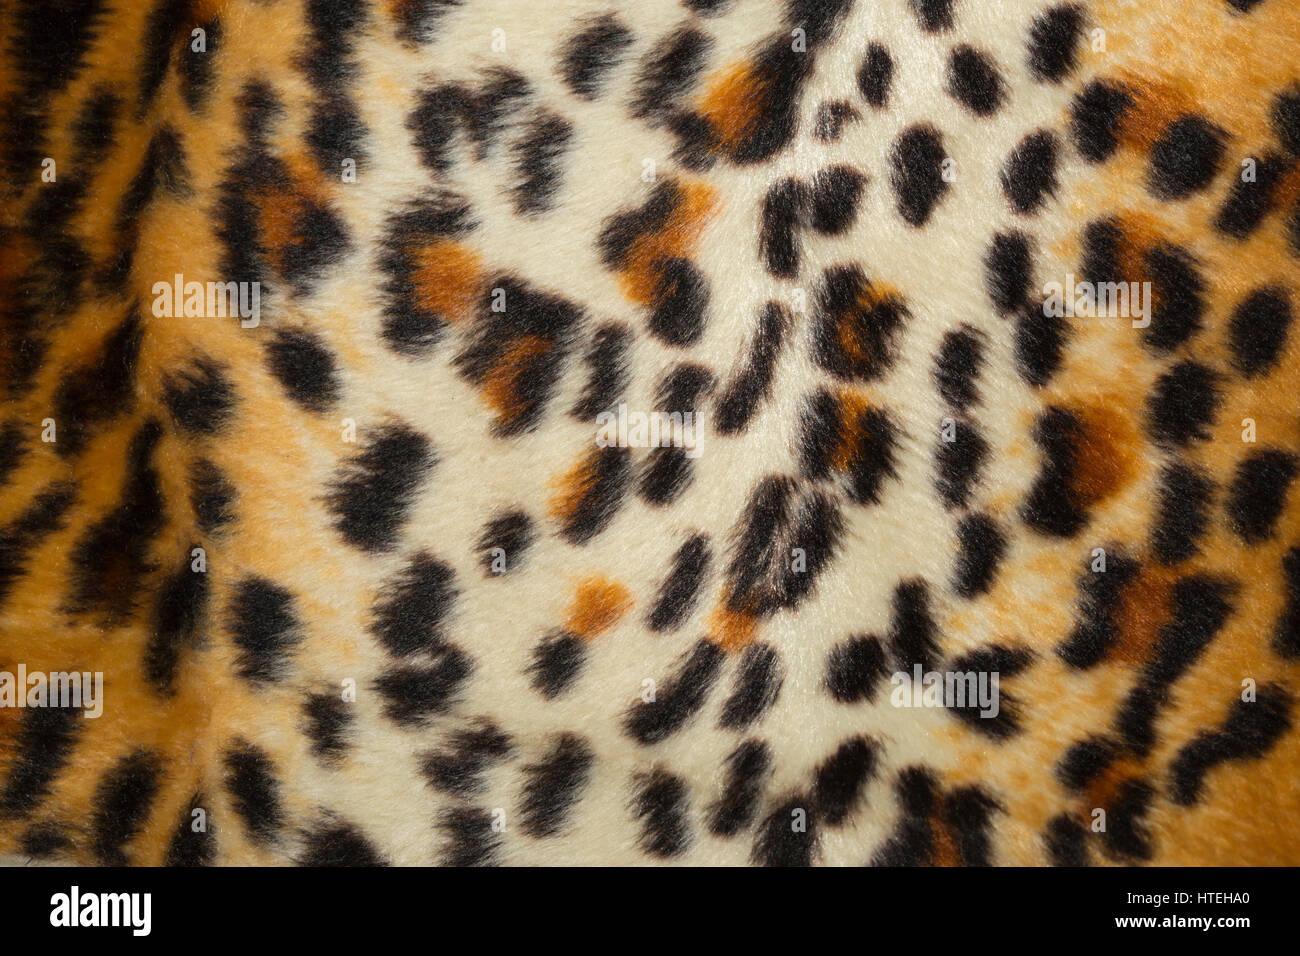 Leopard skin, fake fur, imitation - Stock Image